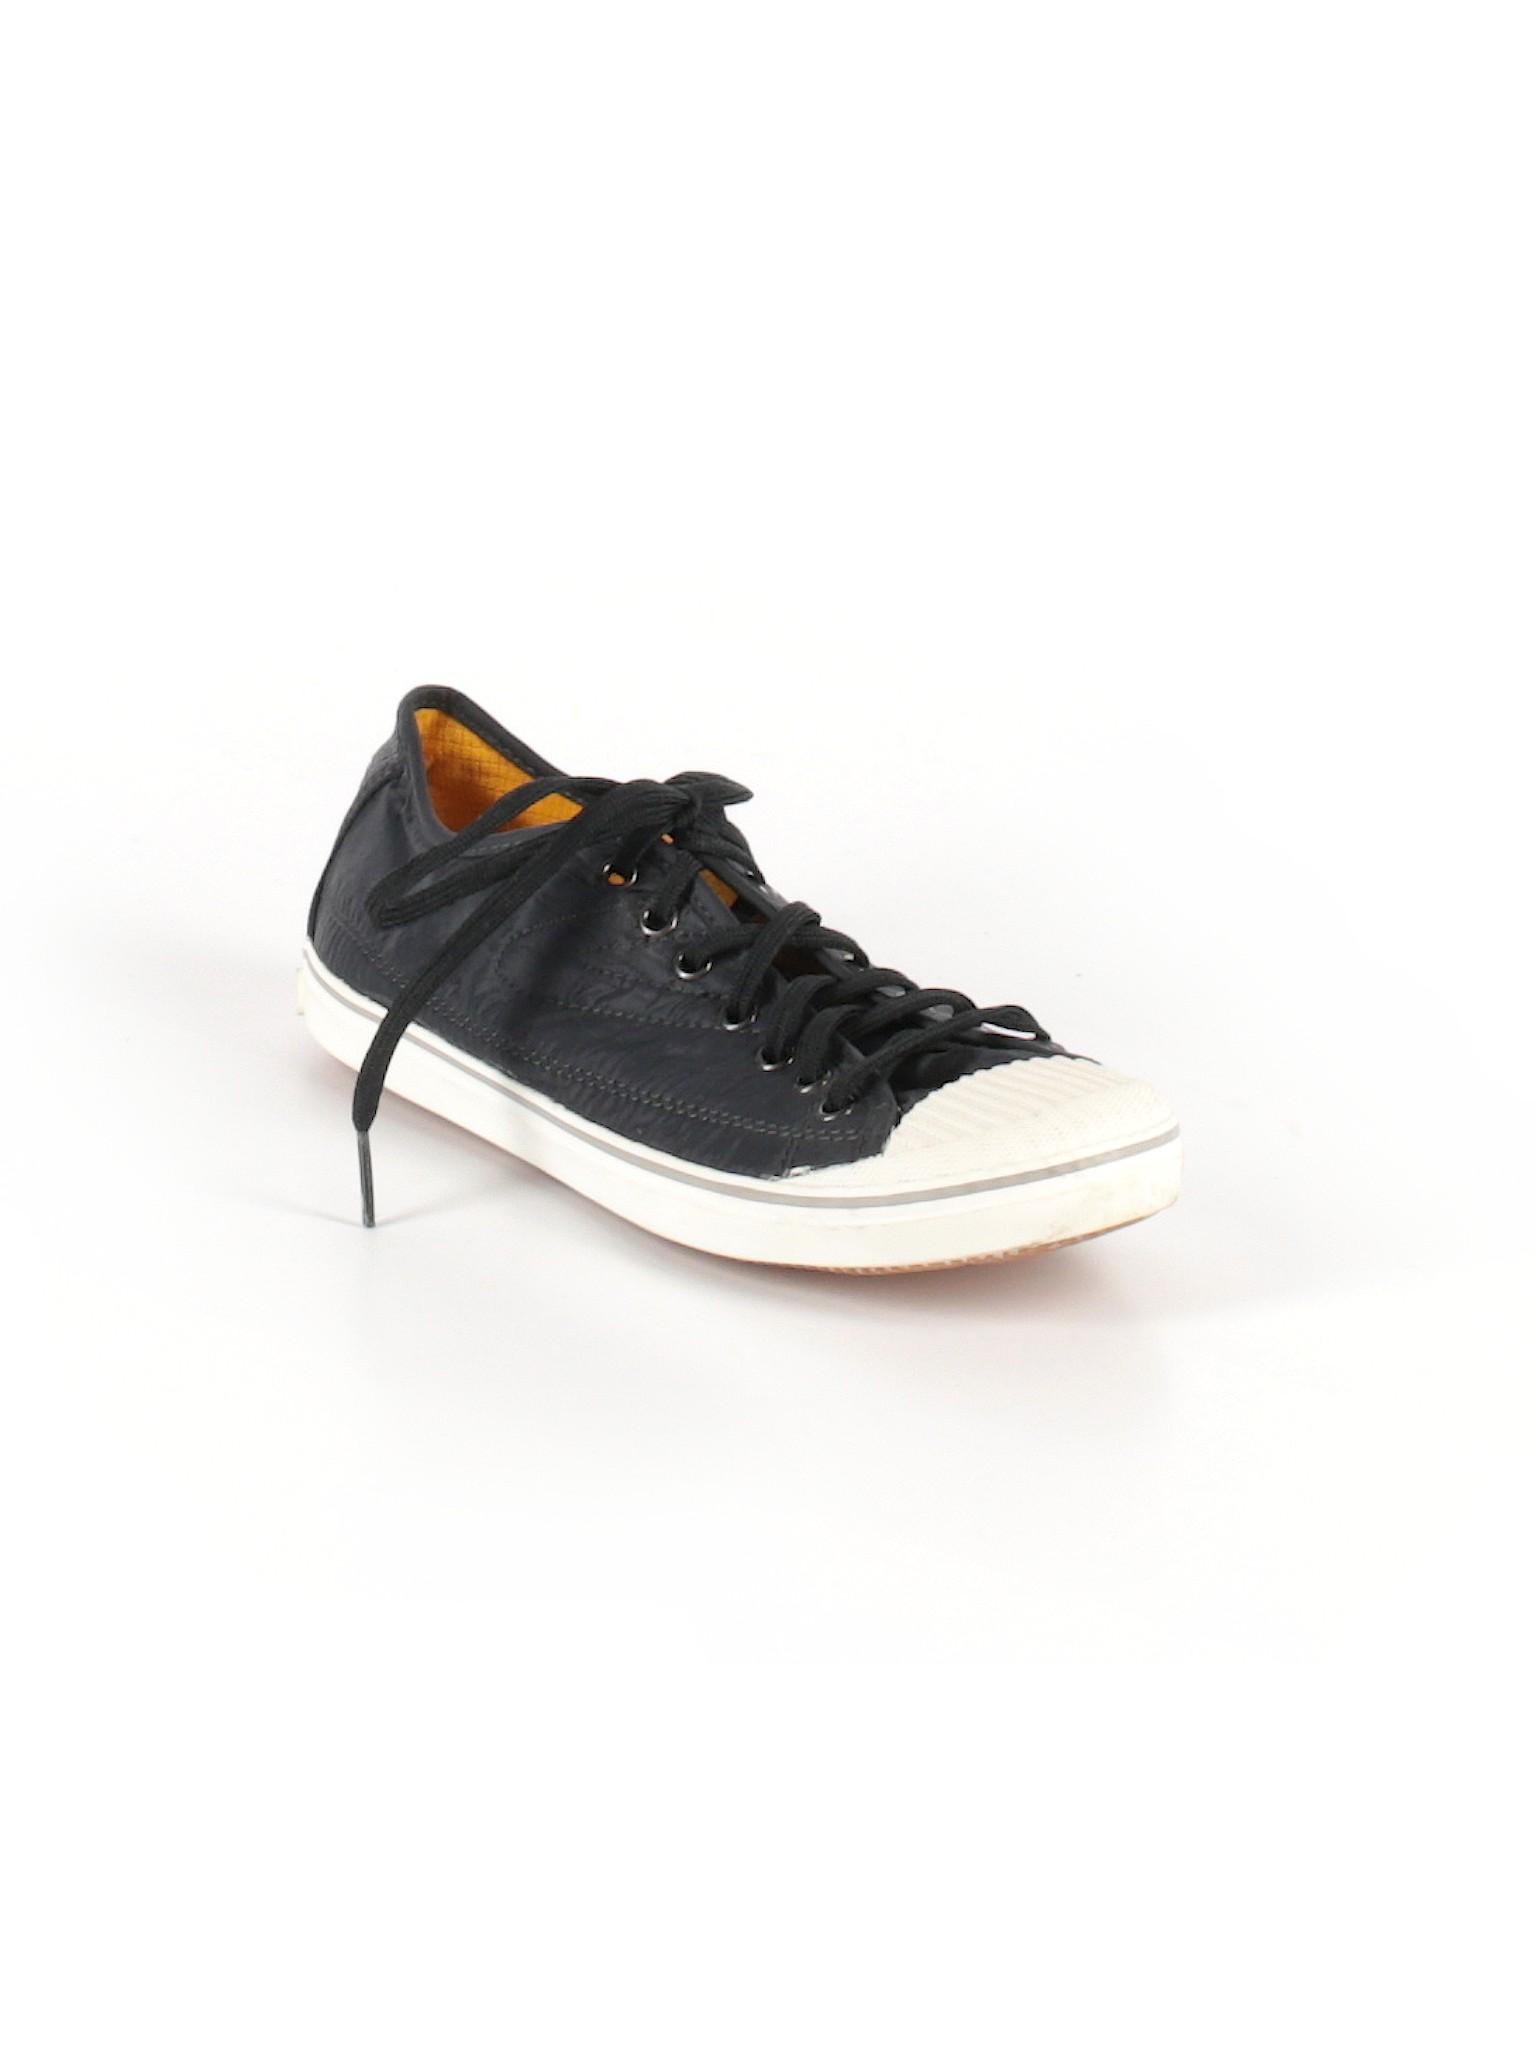 Boutique promotion Sneakers promotion Tretorn Boutique Sneakers Boutique Tretorn promotion Sneakers Tretorn Boutique R0qOwO